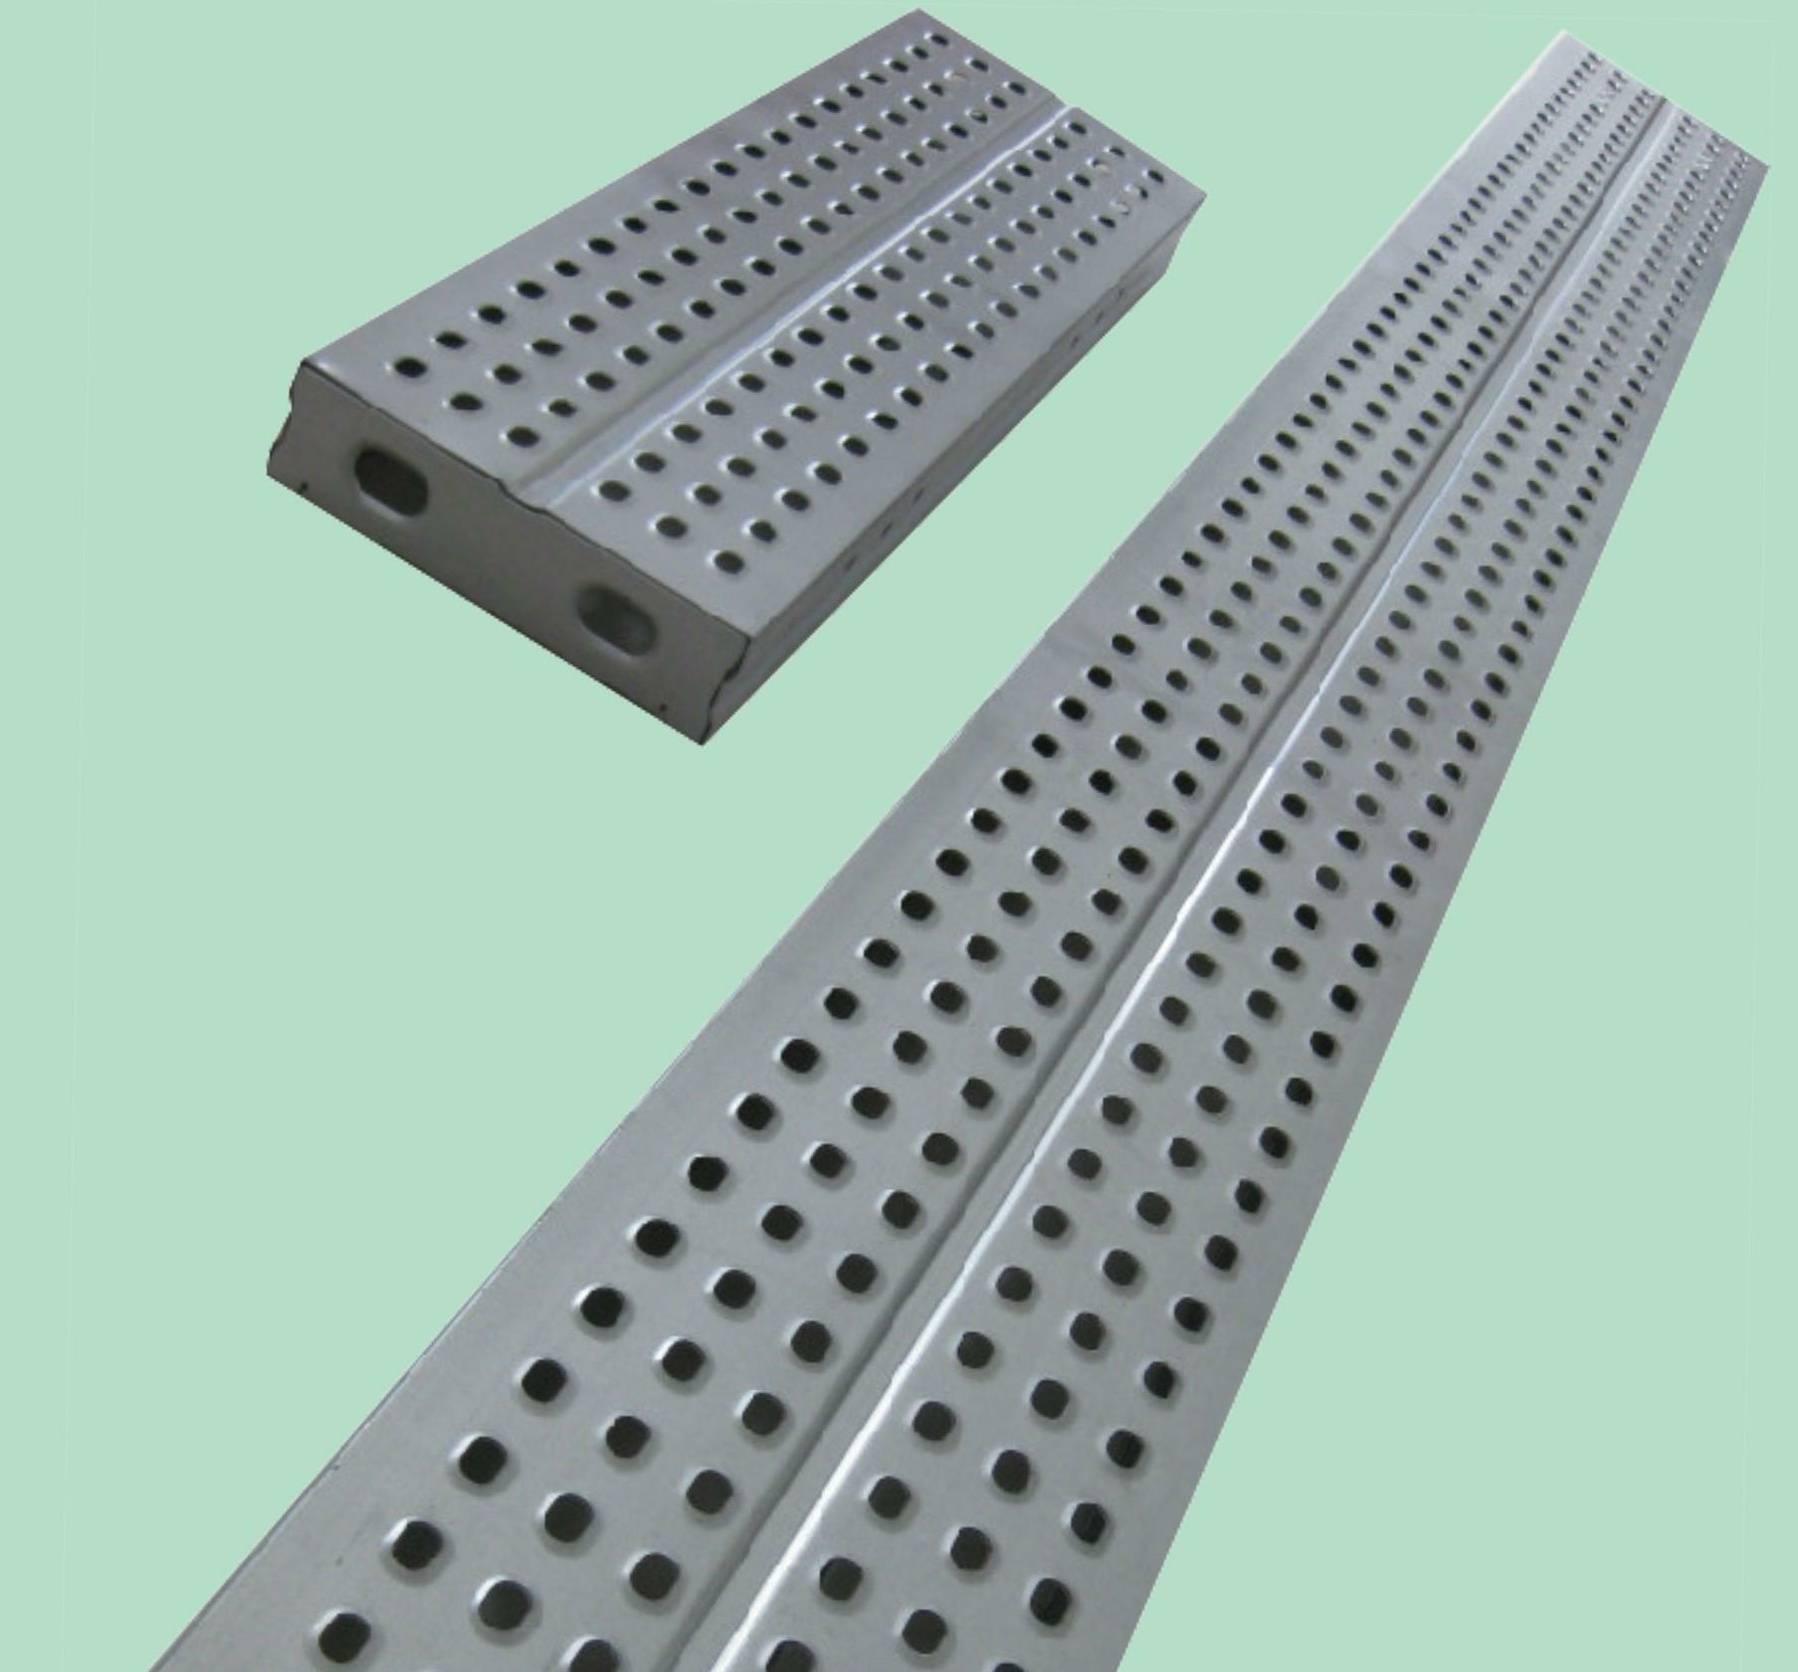 Scaffolding Galvanized Perforated Metal Plank Steel Board Walk Boards